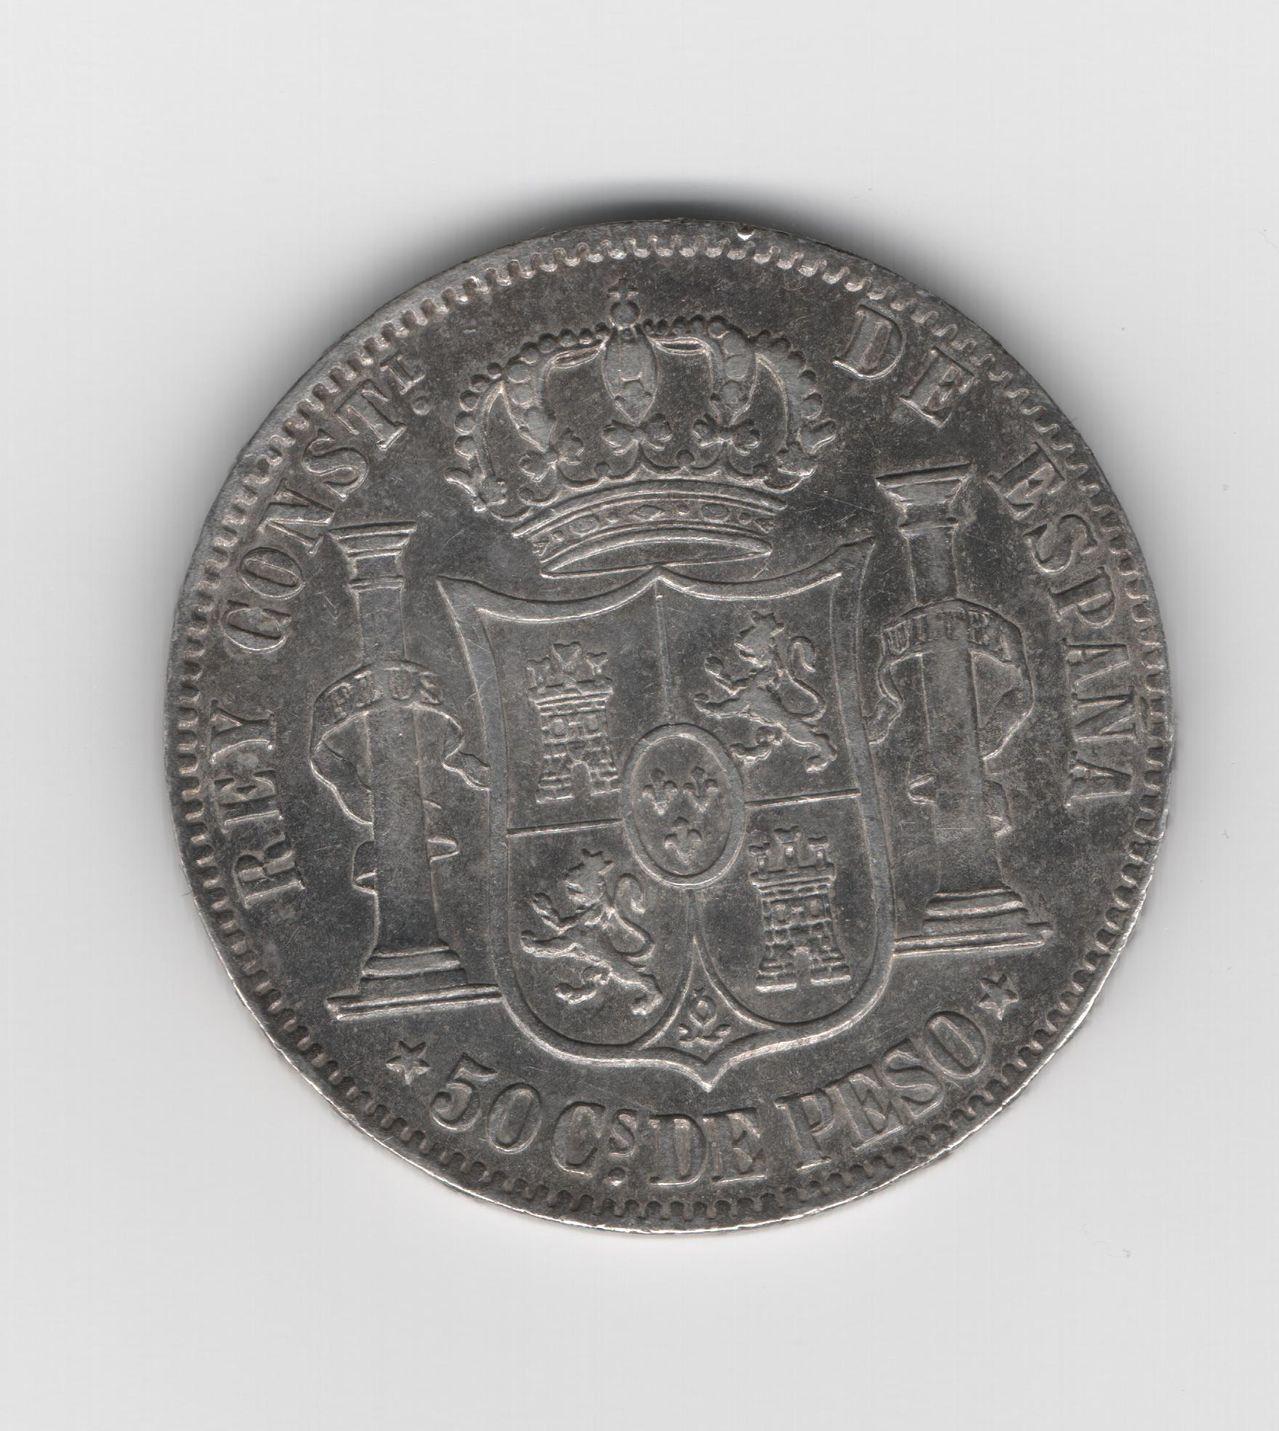 50 Centavos de peso 1885 Alfonso XII - Manila 50_Ctv_Peso_1885_Manila_B_12_93_gr_29_6mm